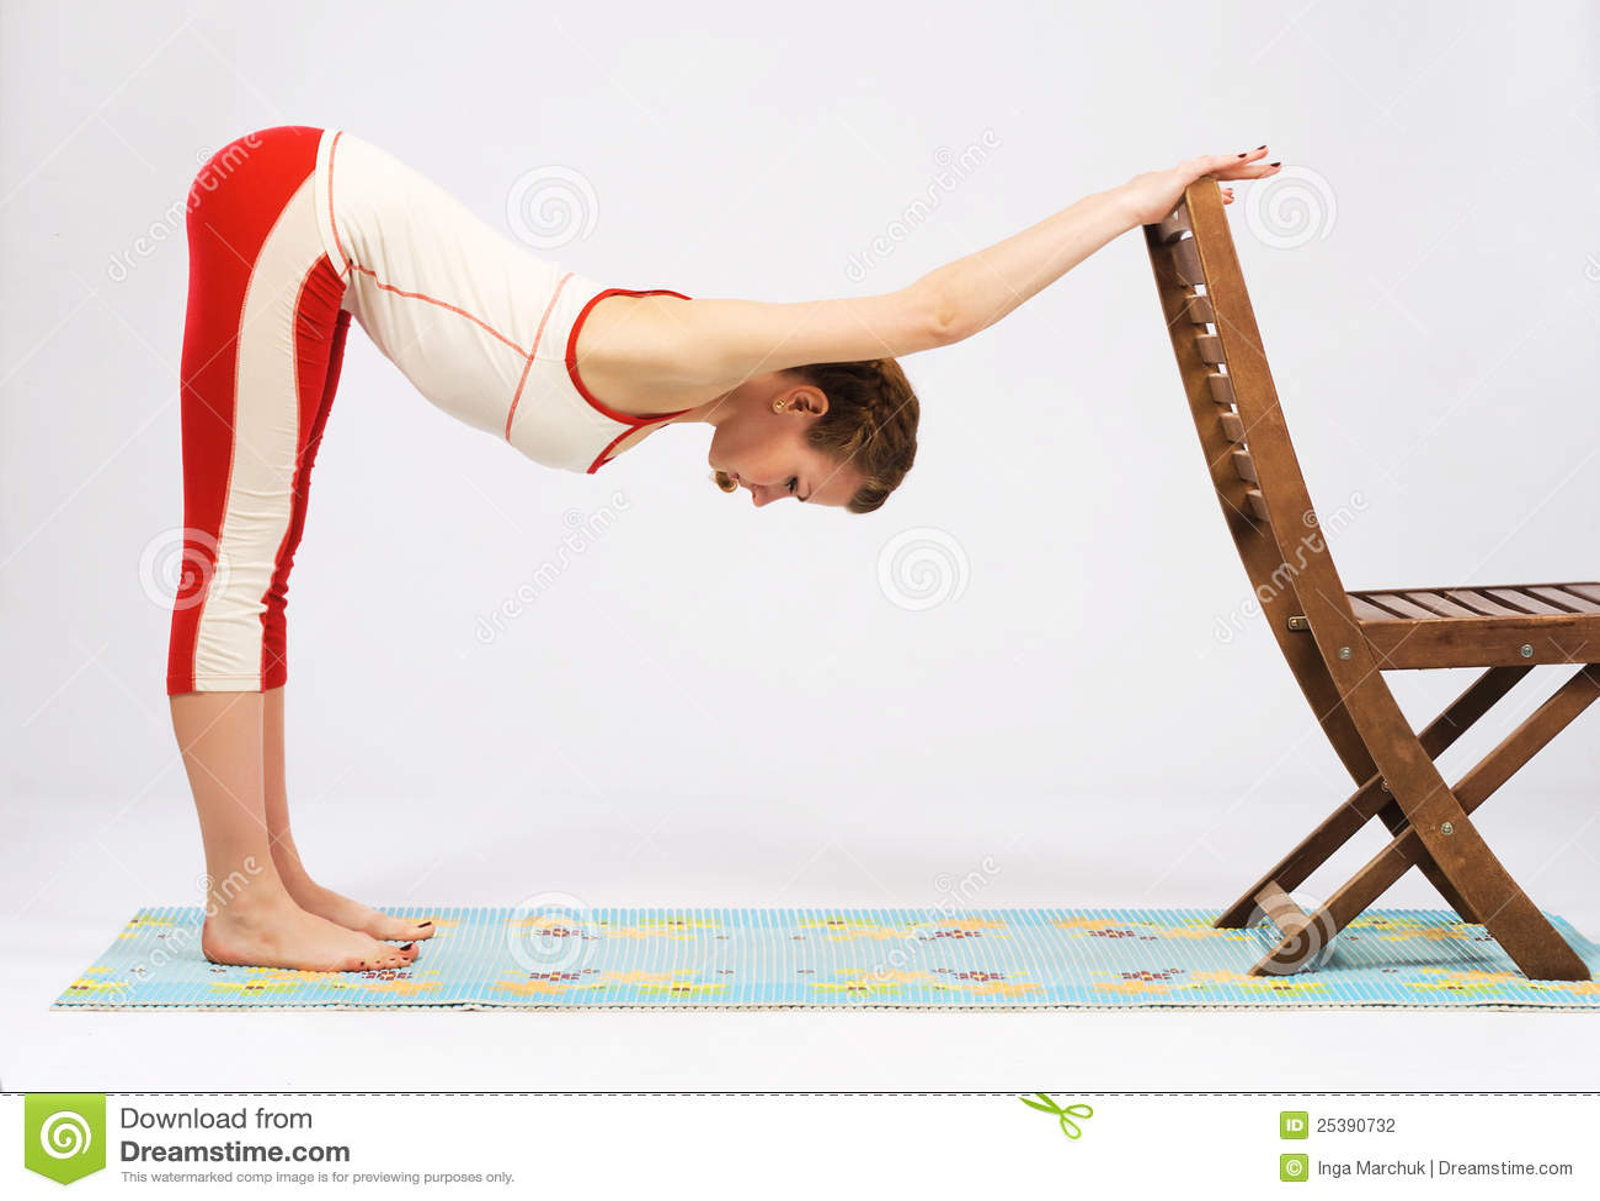 Как научиться гибкости в домашних условиях